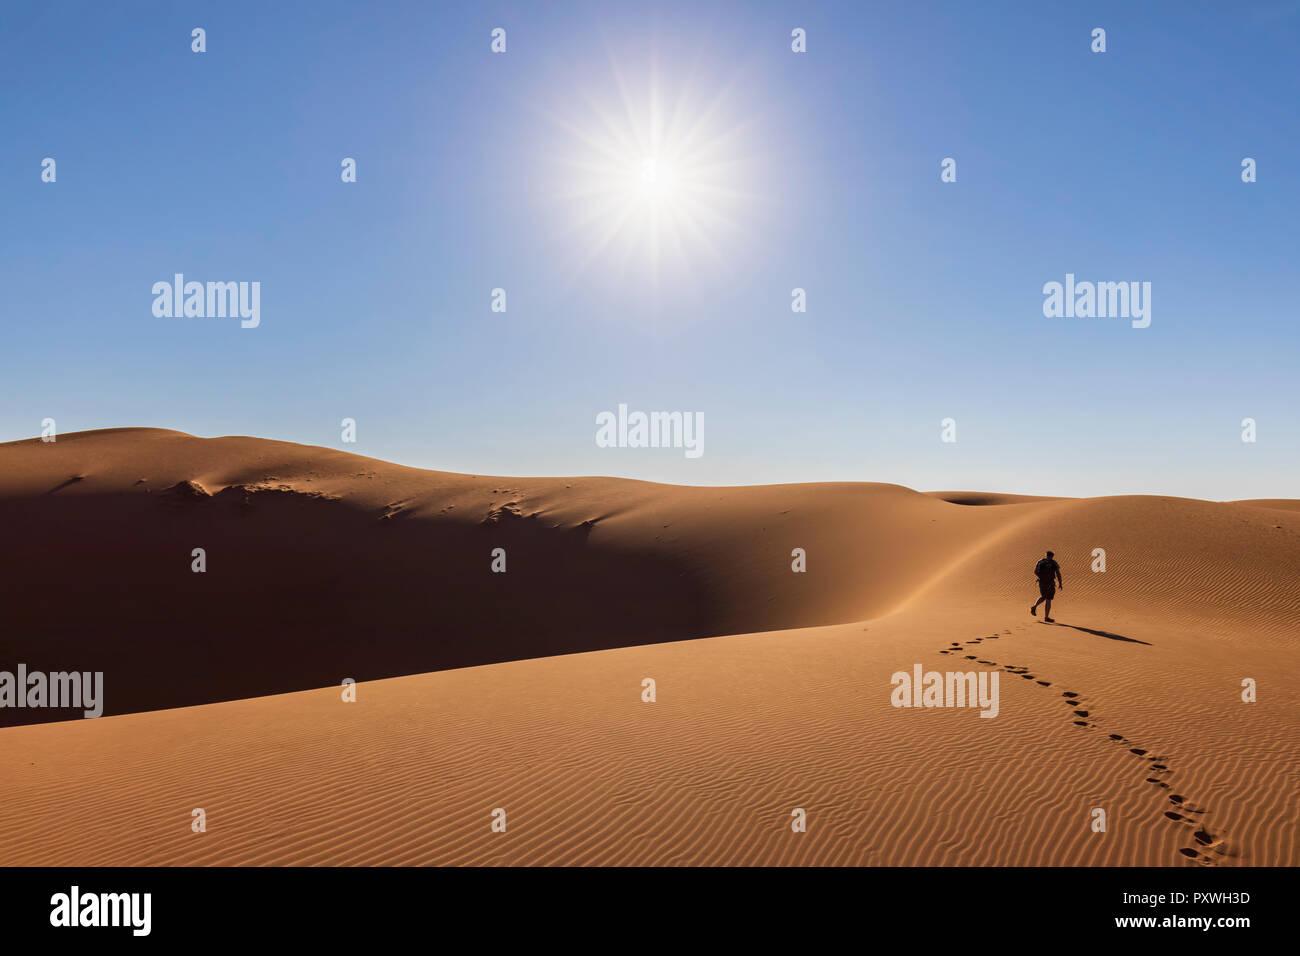 Africa, Namibia, Namib desert, Naukluft National Park, tourist walking on dune - Stock Image